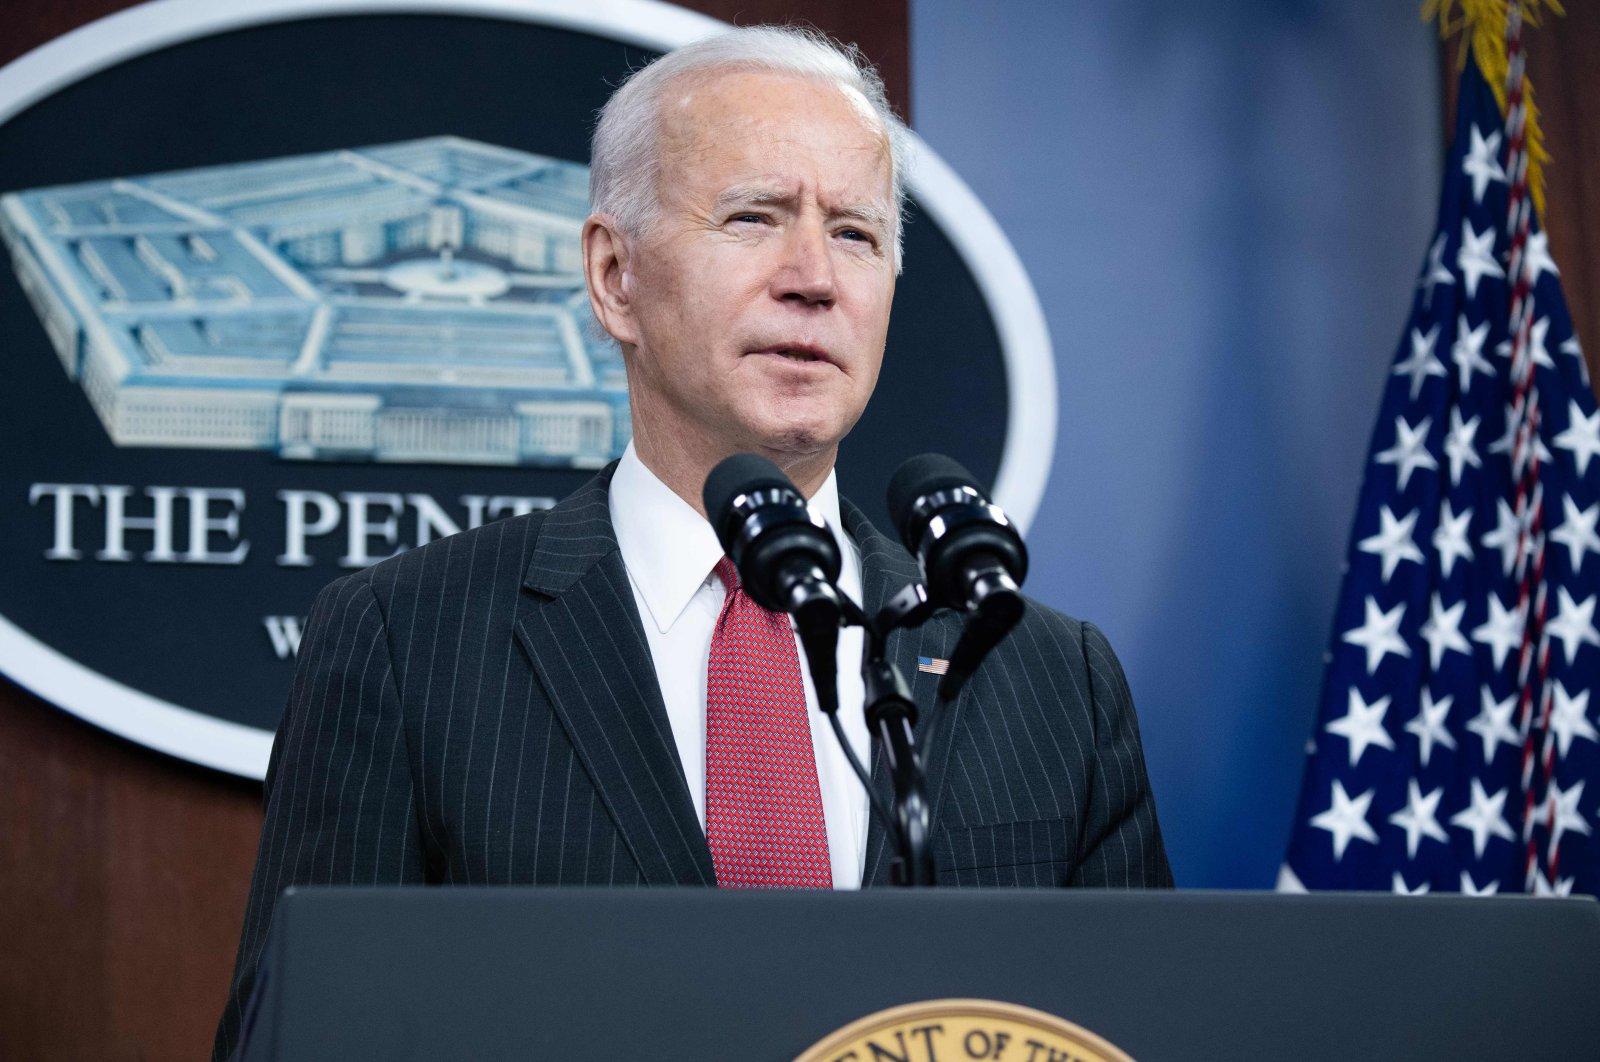 US President Joe Biden speaks during a visit to the Pentagon in Washington D.C., Feb. 10, 2021. (AFP Photo)